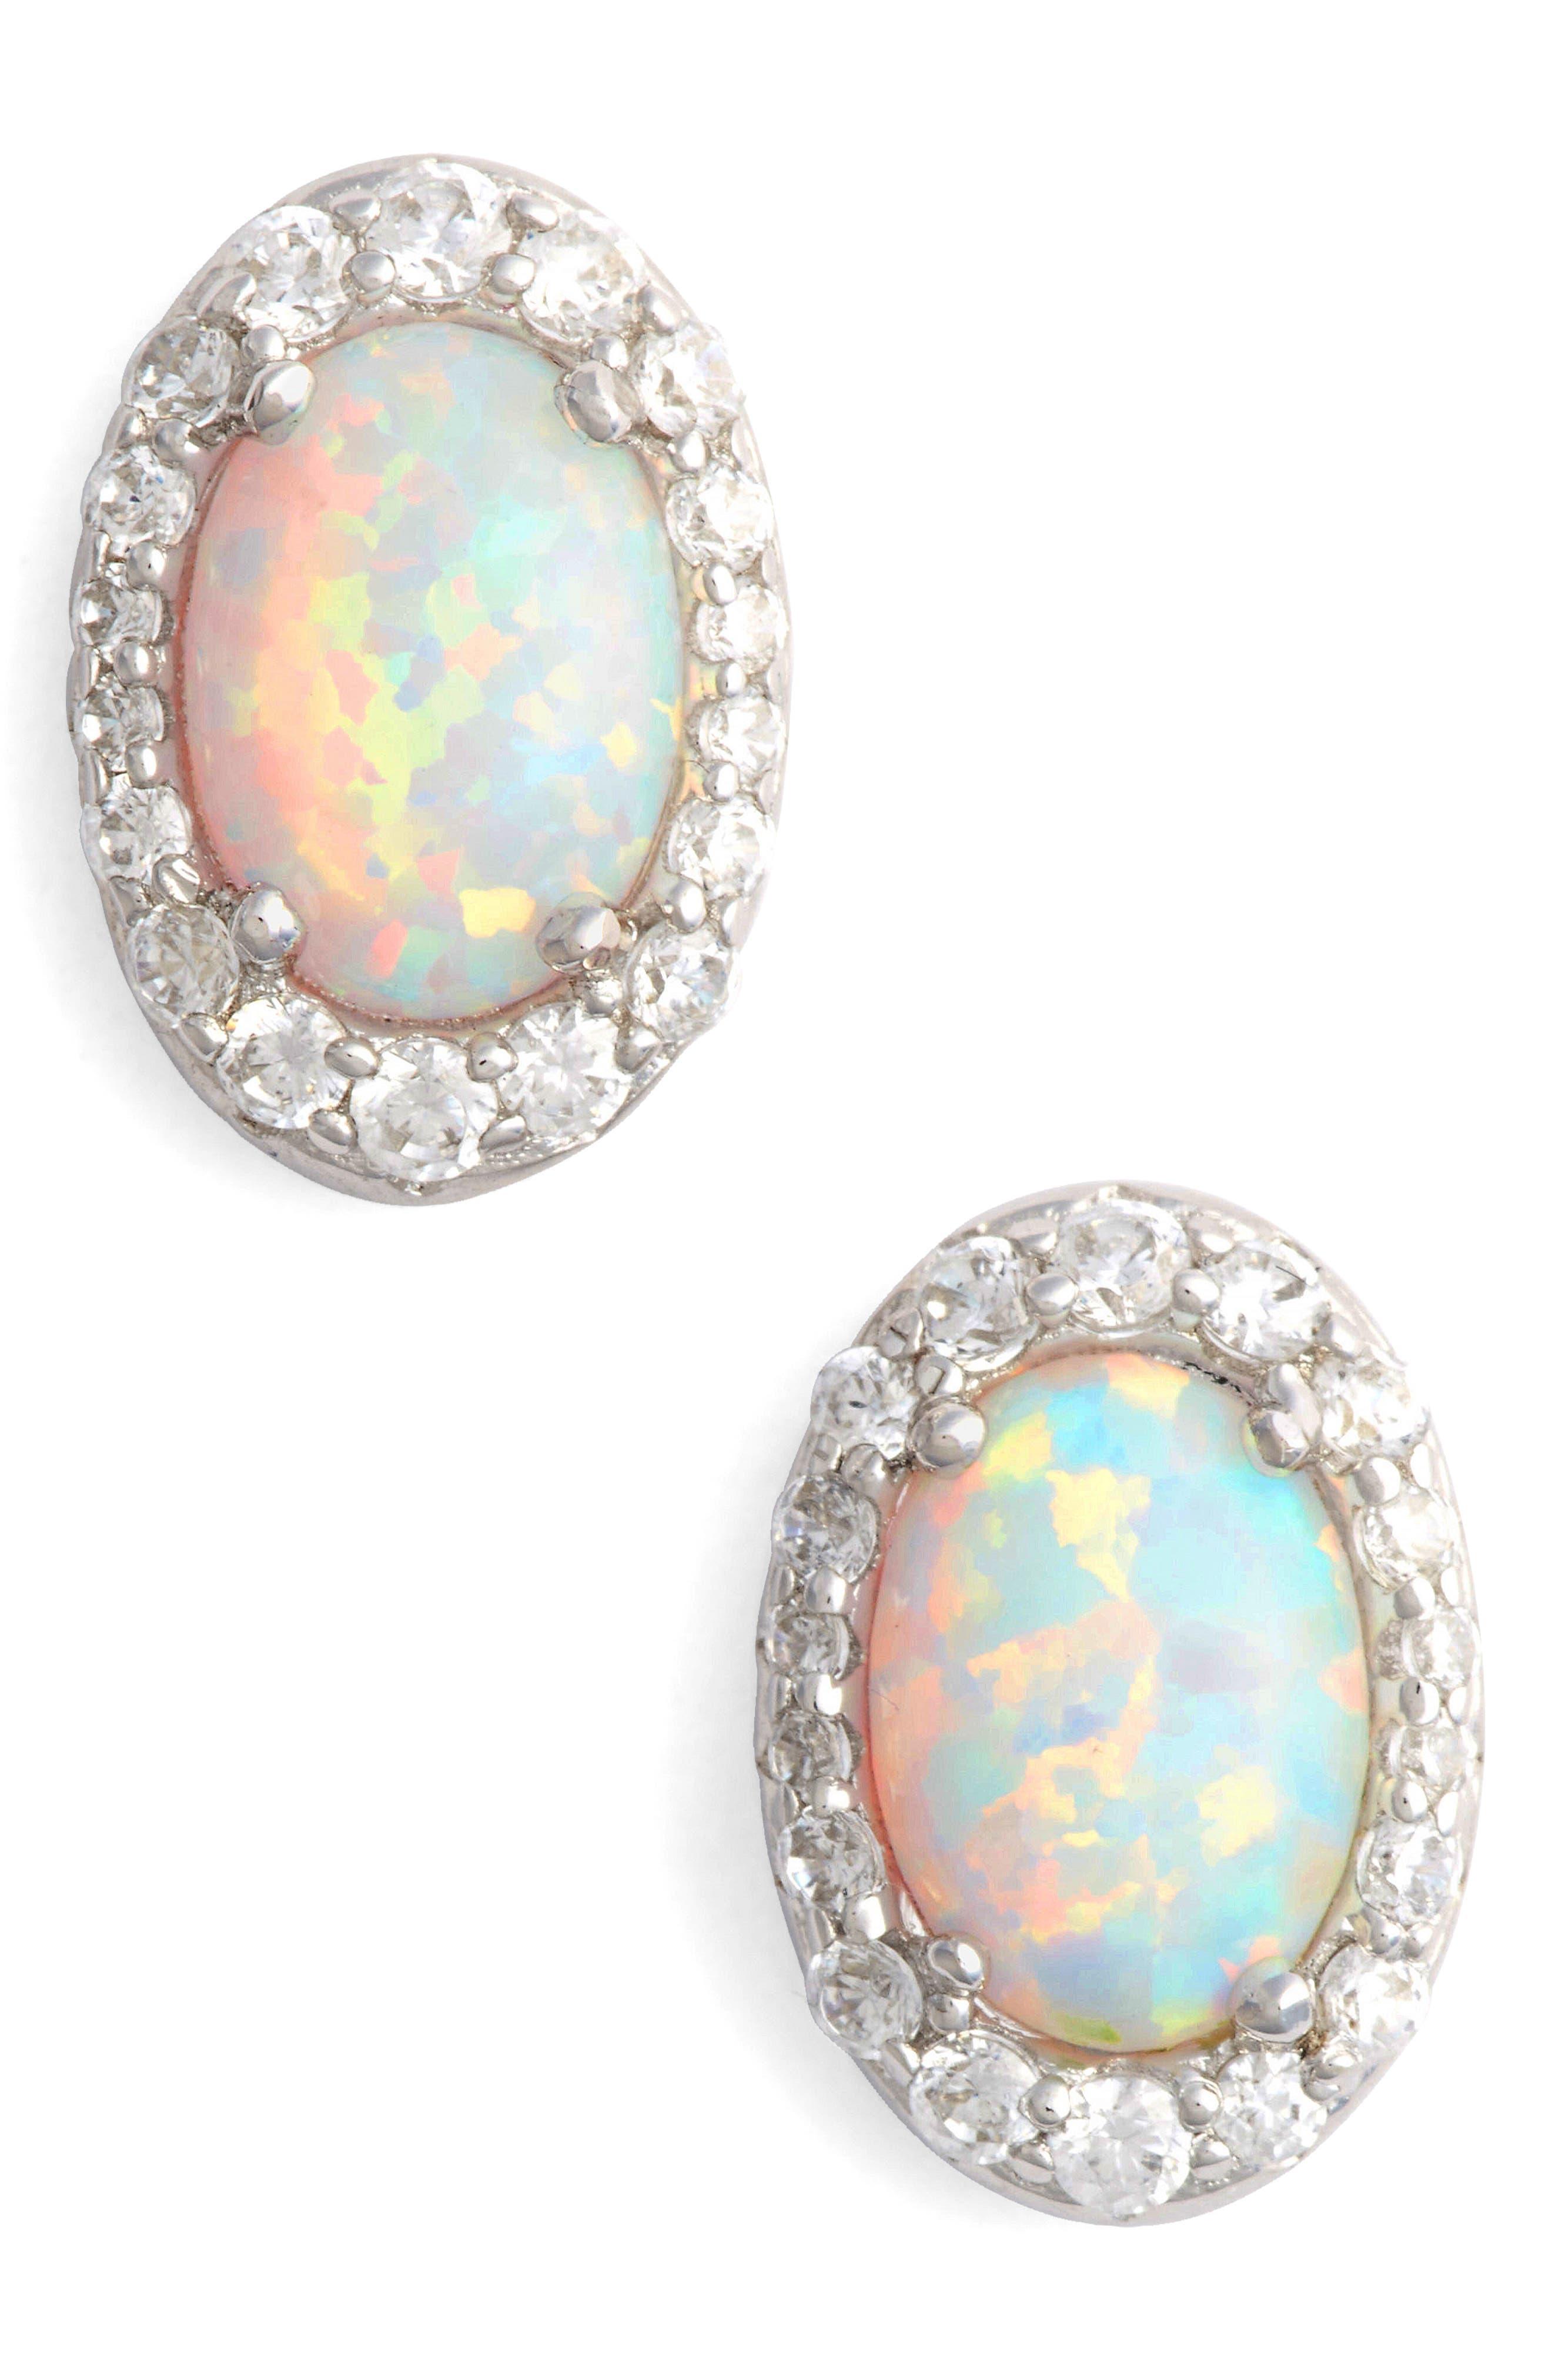 Main Image - Lafonn Simulated Opal Halo Stud Earrings